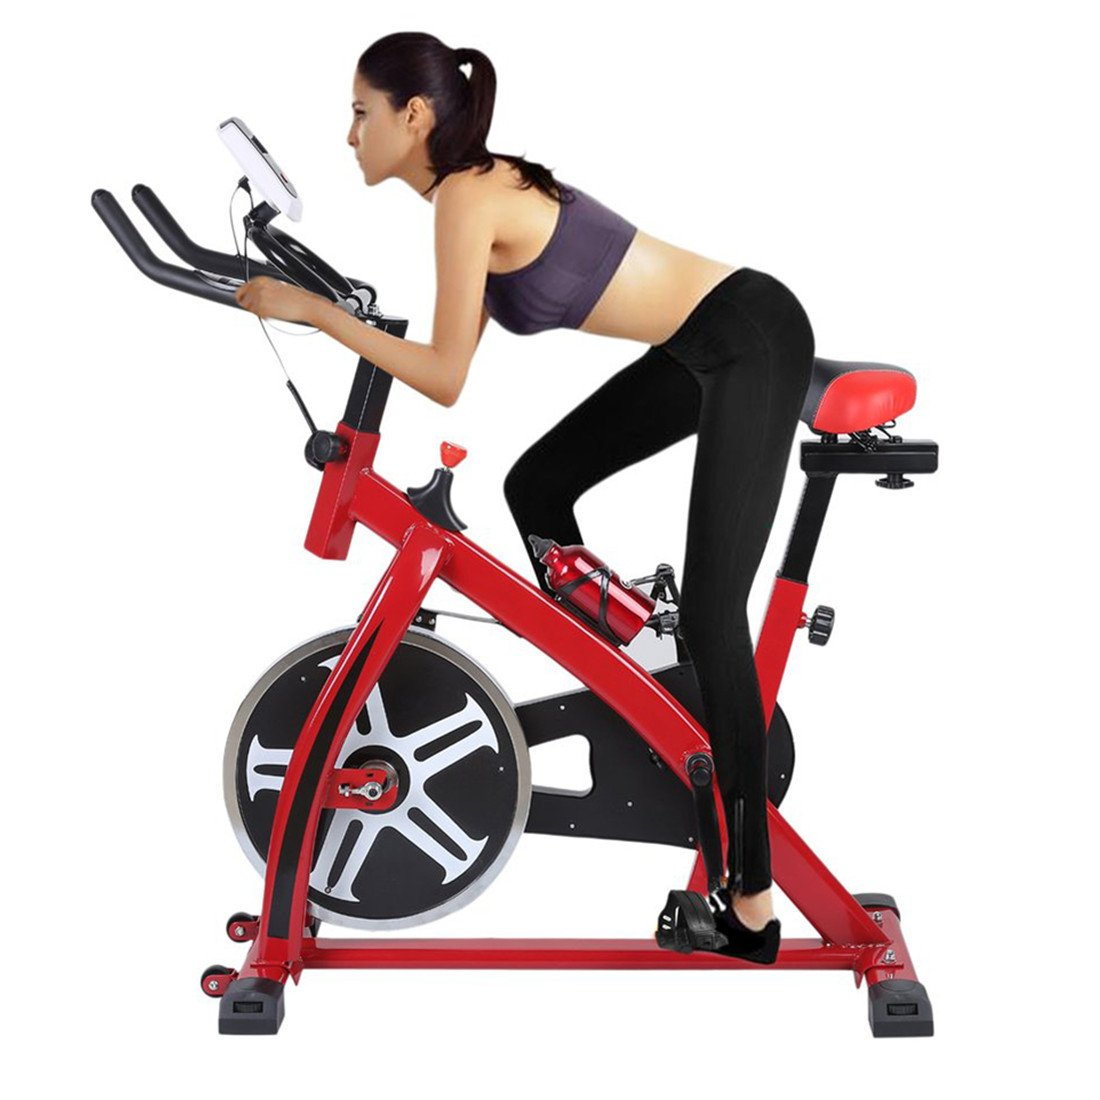 blackpoolal sp6901 Home trainer LCD Fitness Bicicleta Estática ...